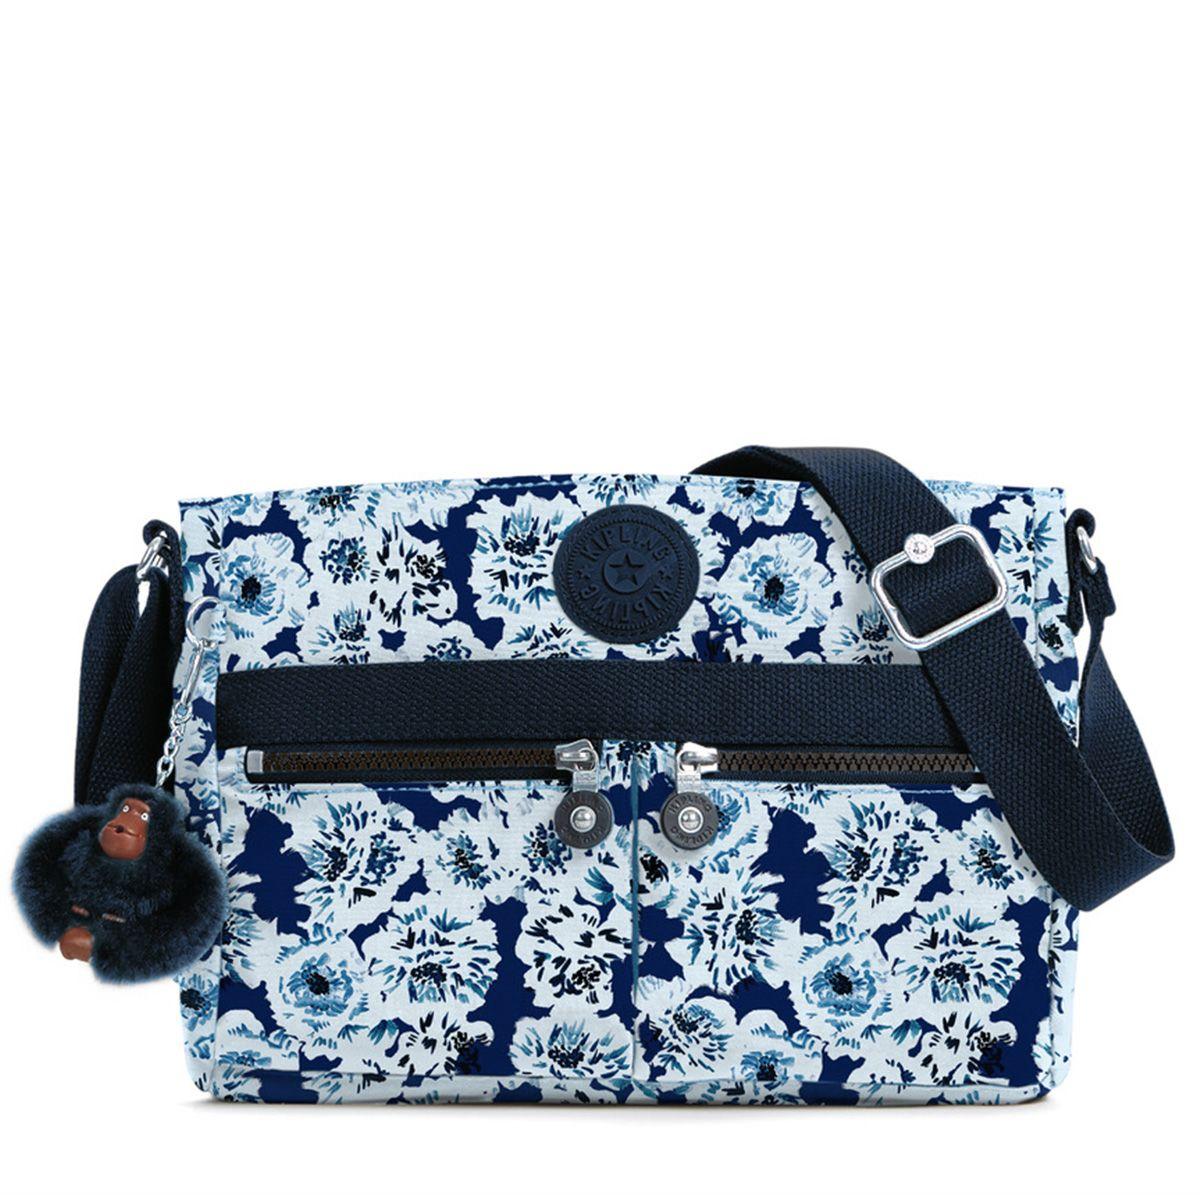 fe5ccac2d95f Clearance Closeout Kipling Handbags